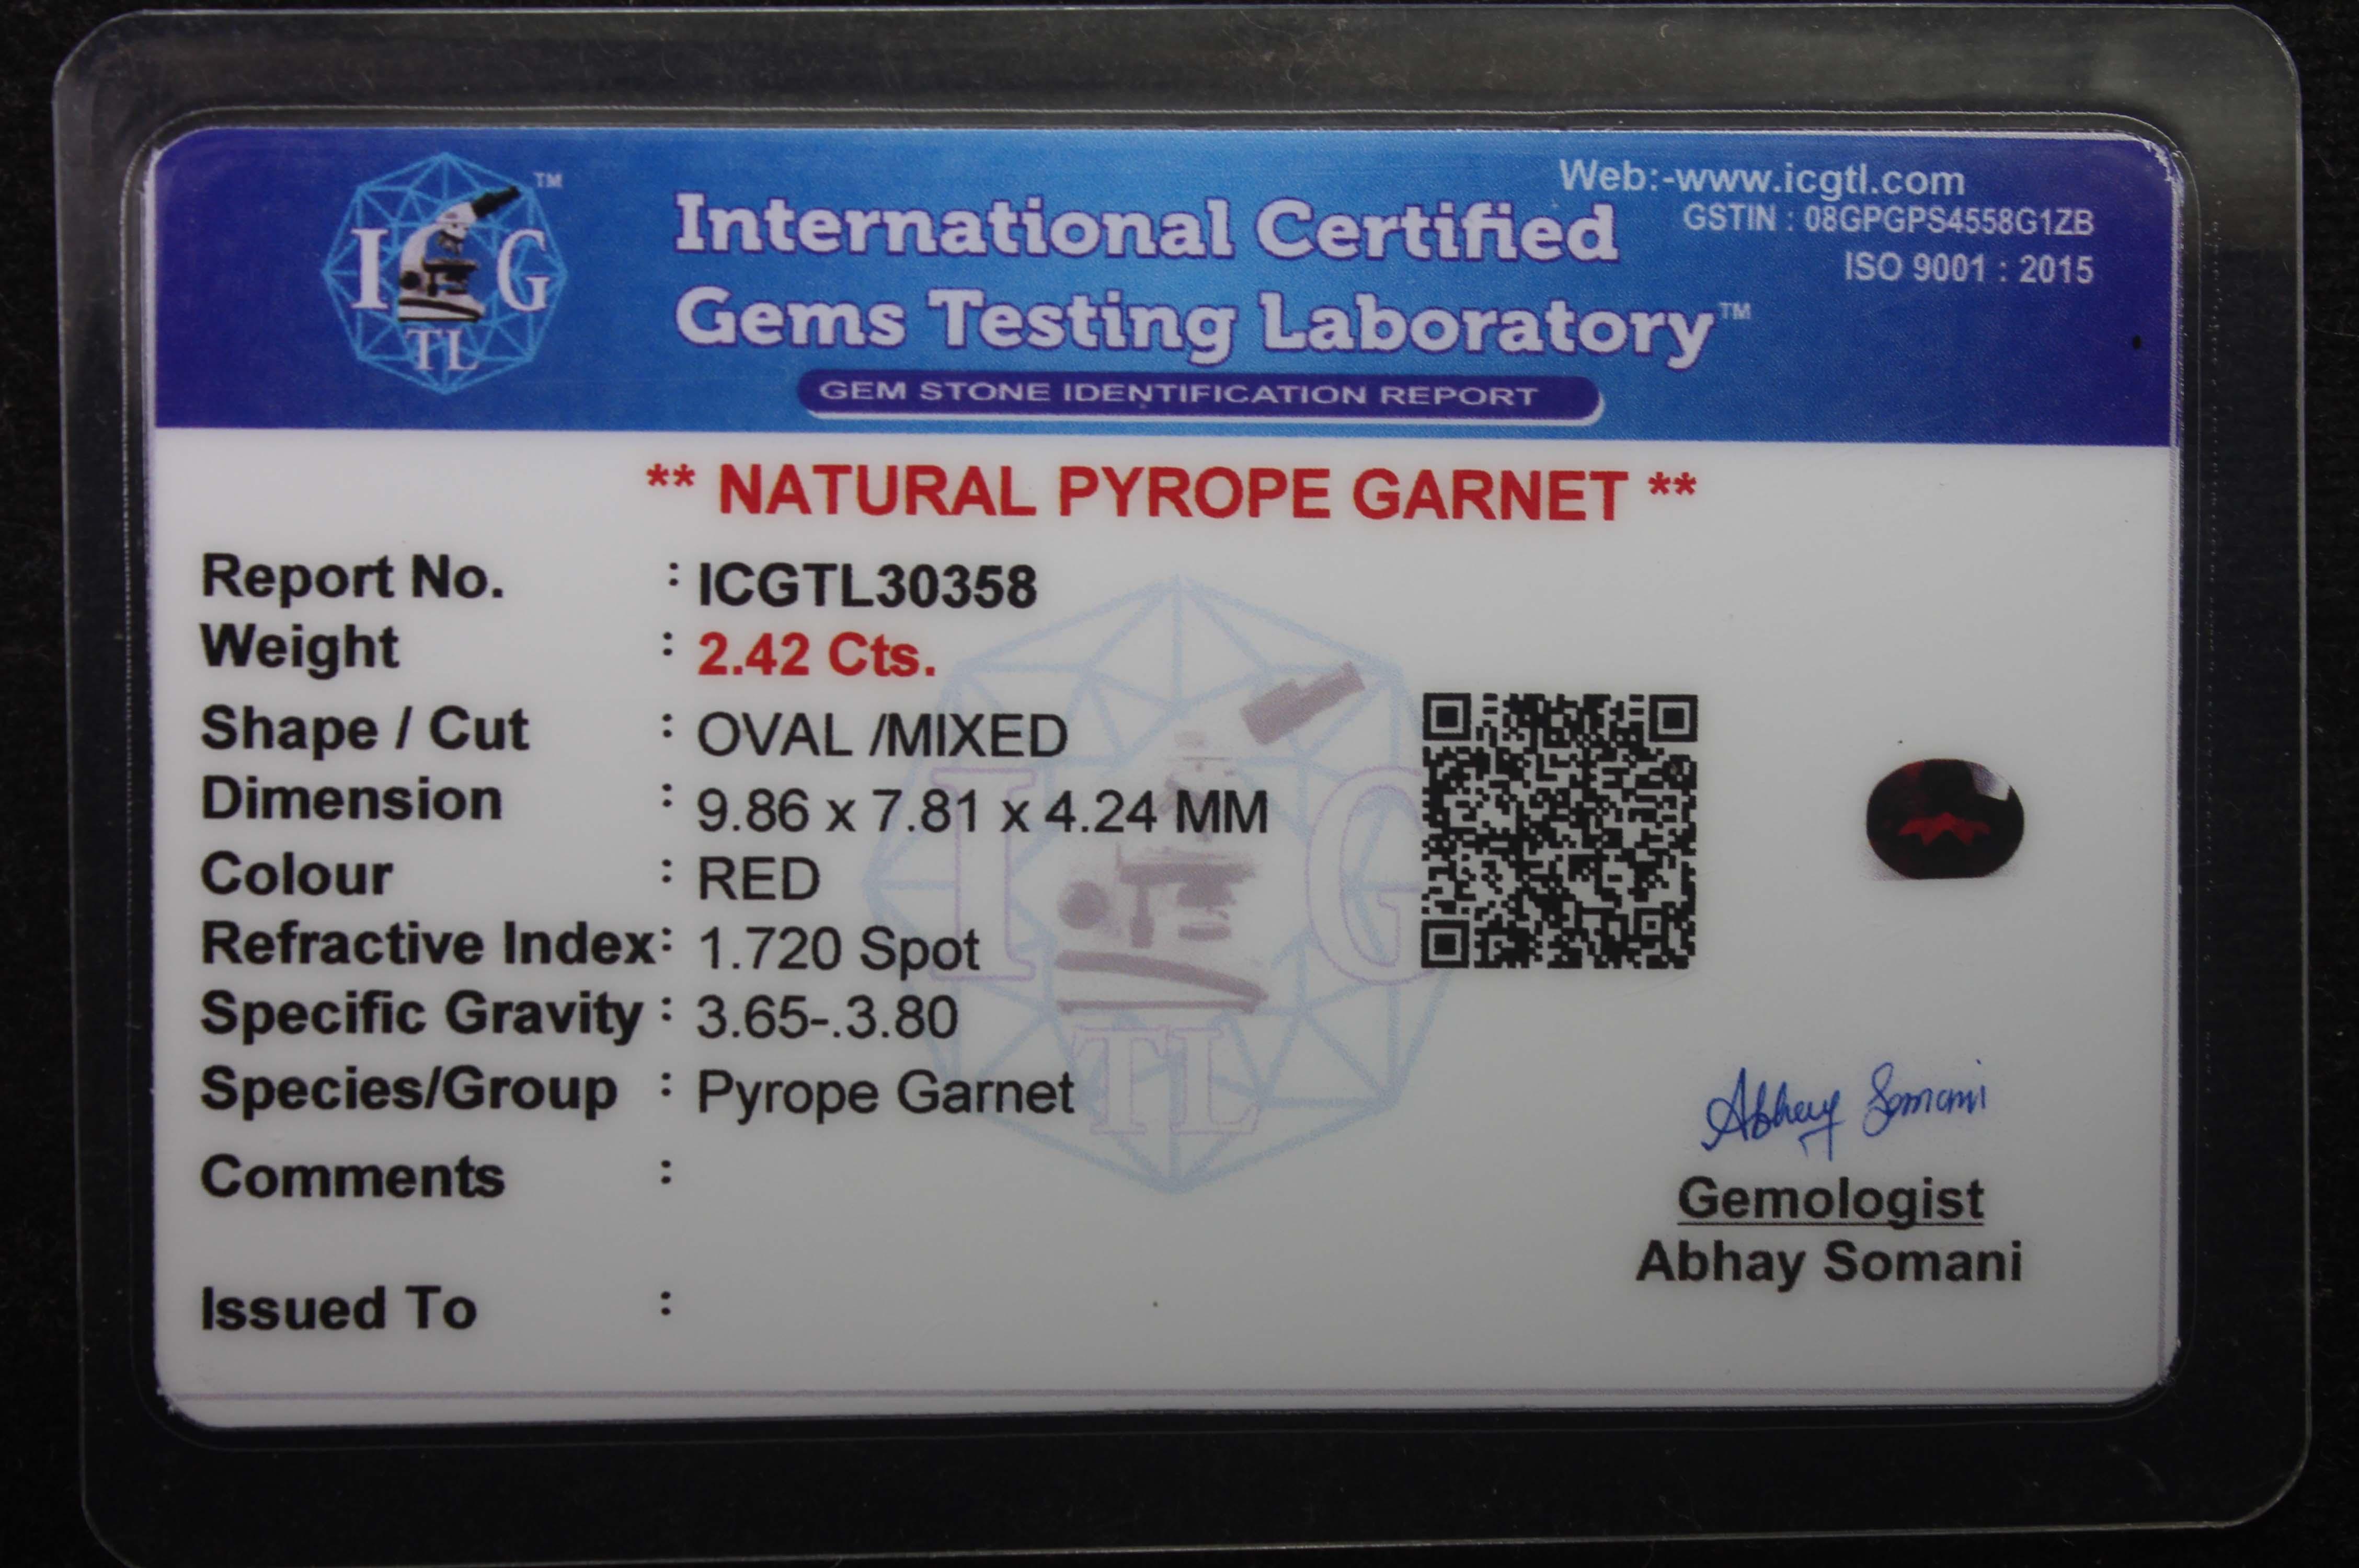 Garnet 2.42 Ct - Image 5 of 5